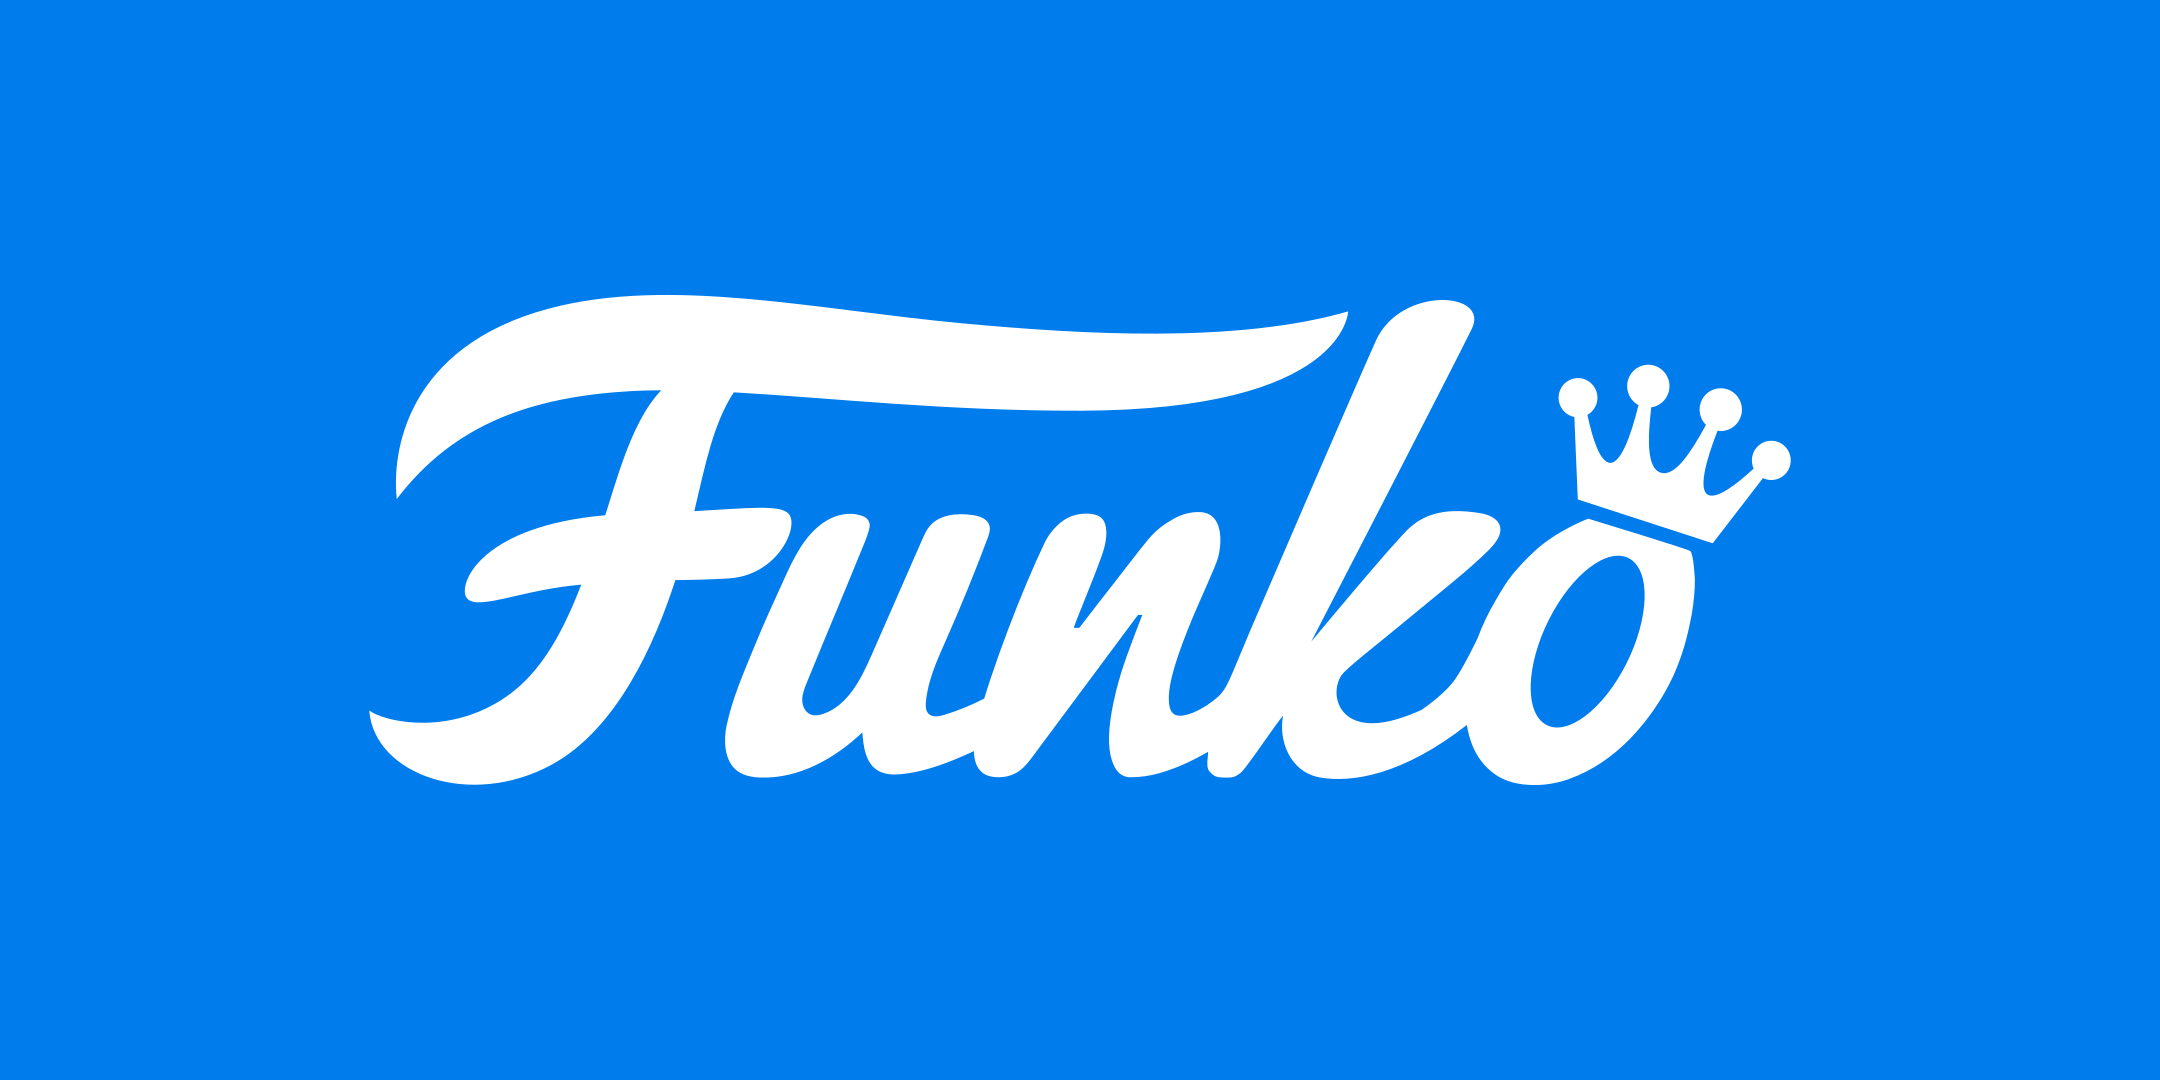 funko logo 2 - Funko Logo